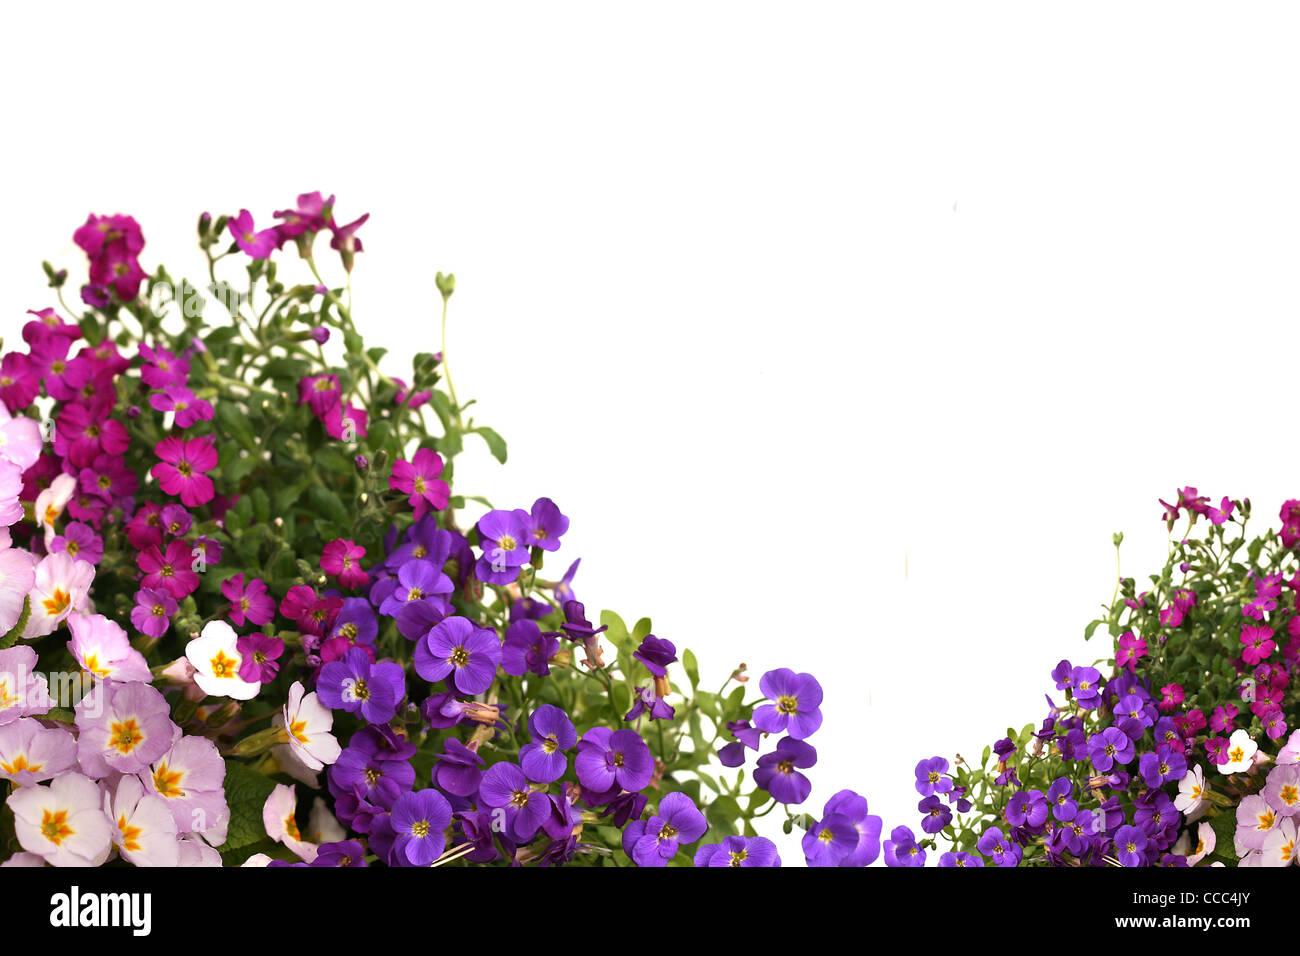 Spring flowers border stock photo 42063699 alamy spring flowers border mightylinksfo